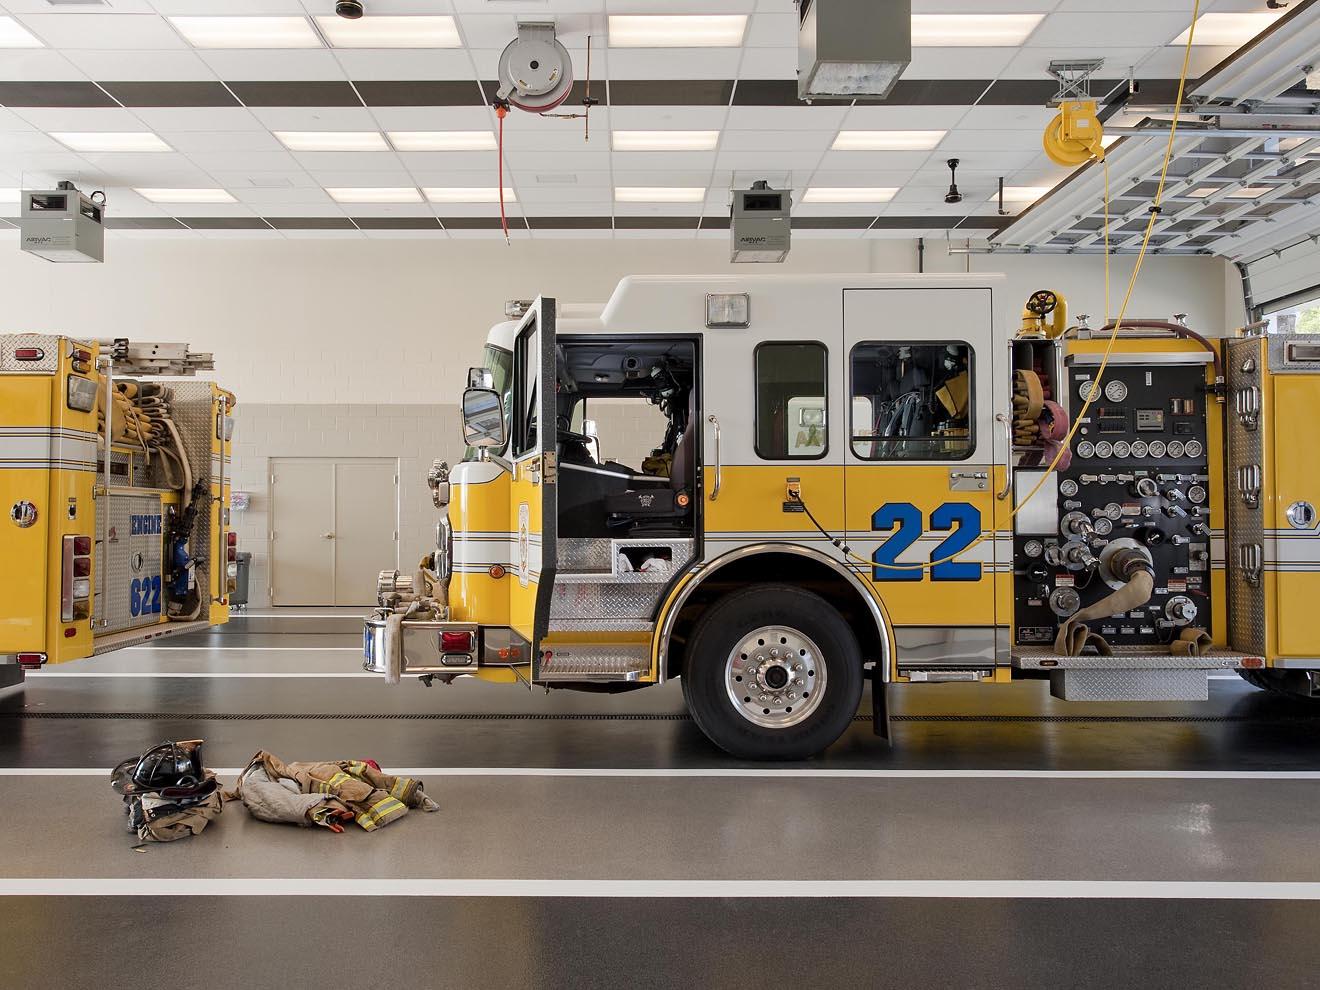 fire truck and ready gear inside